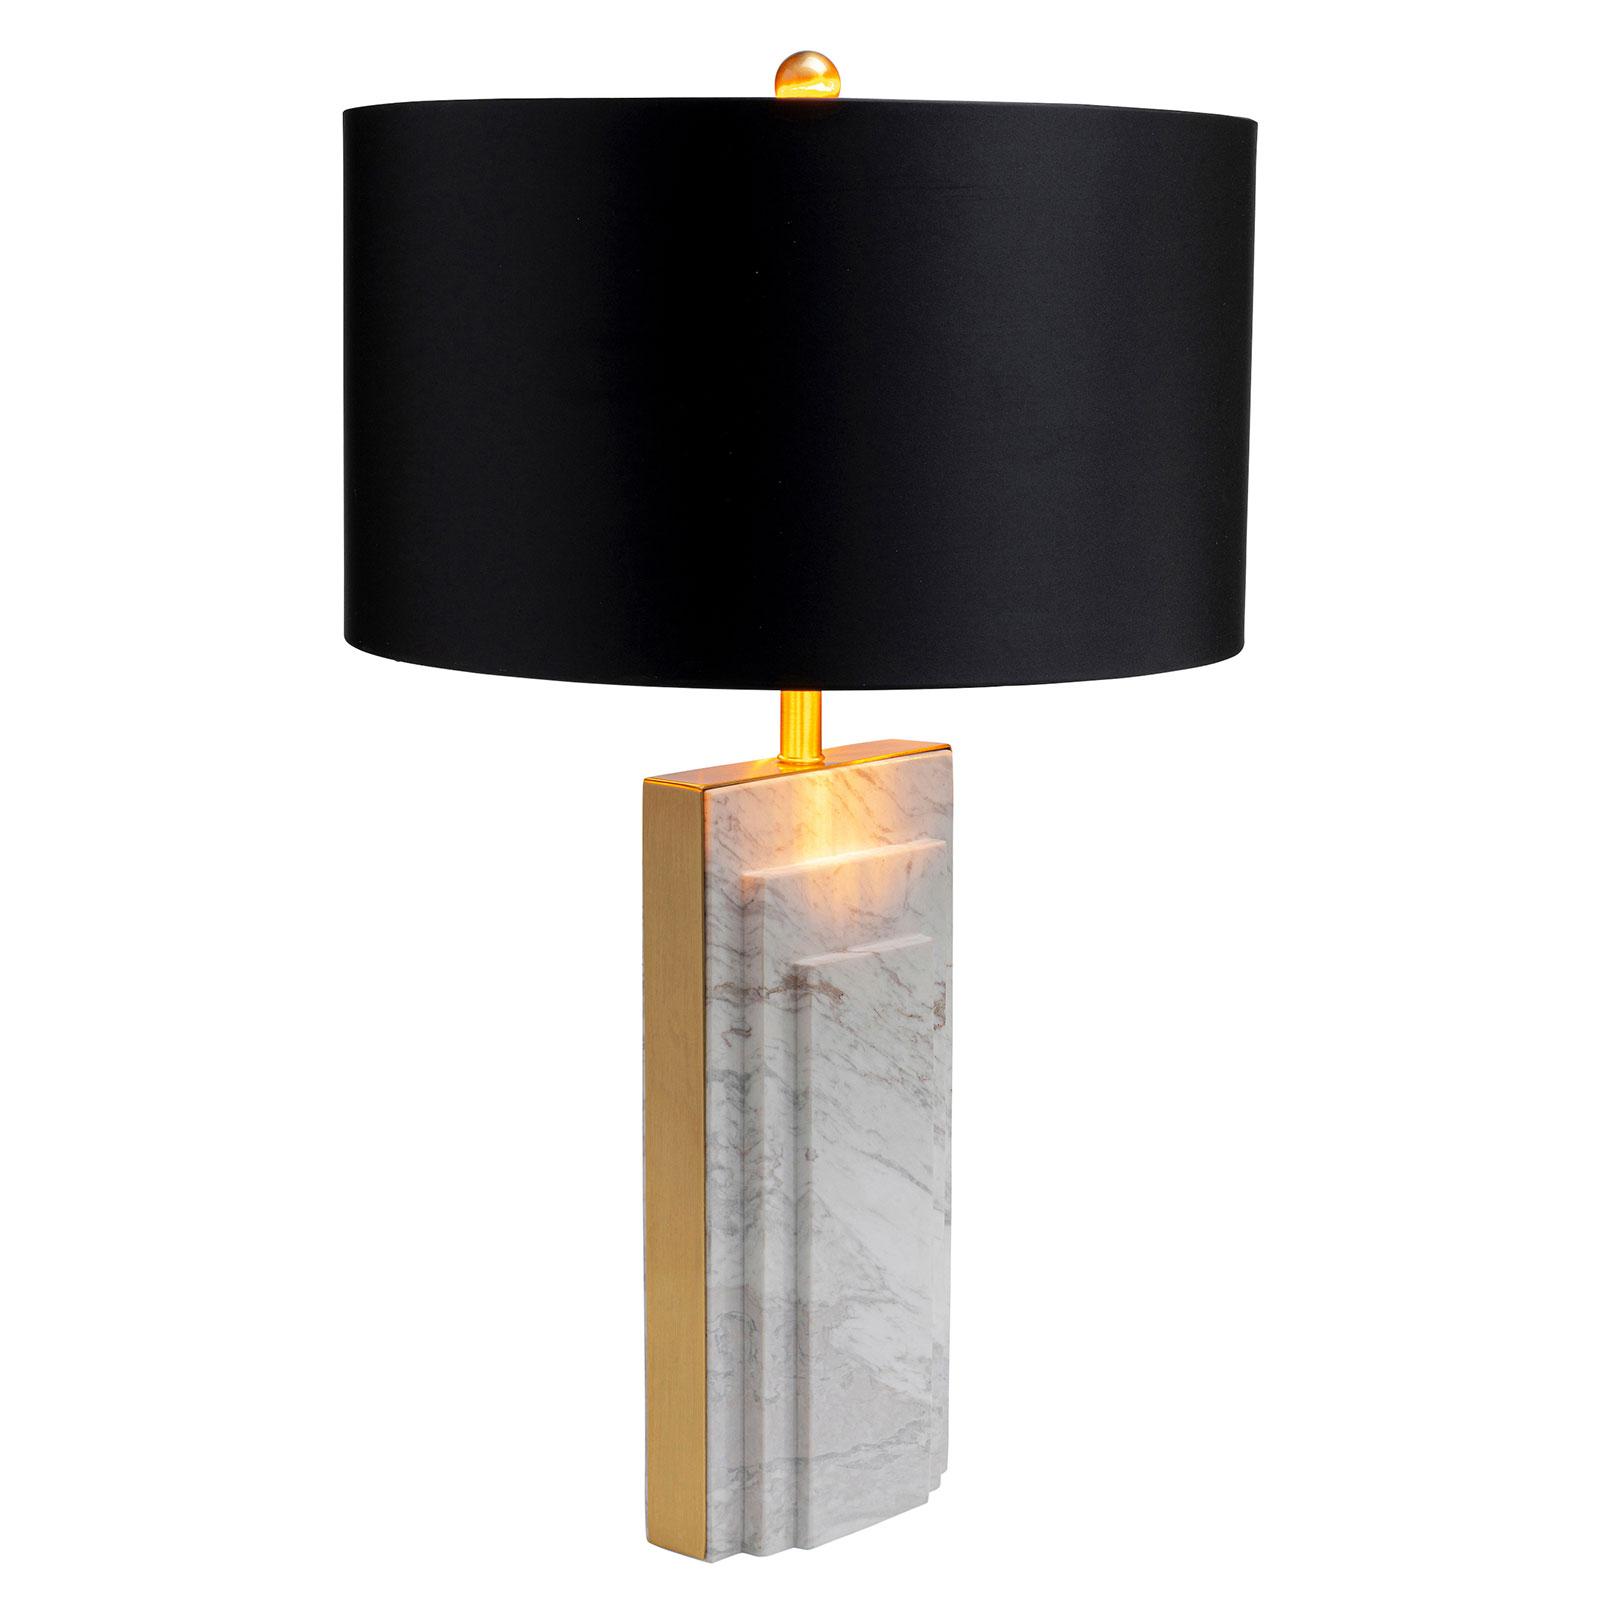 KARE Rumba Marble lampa stołowa marmur, biała